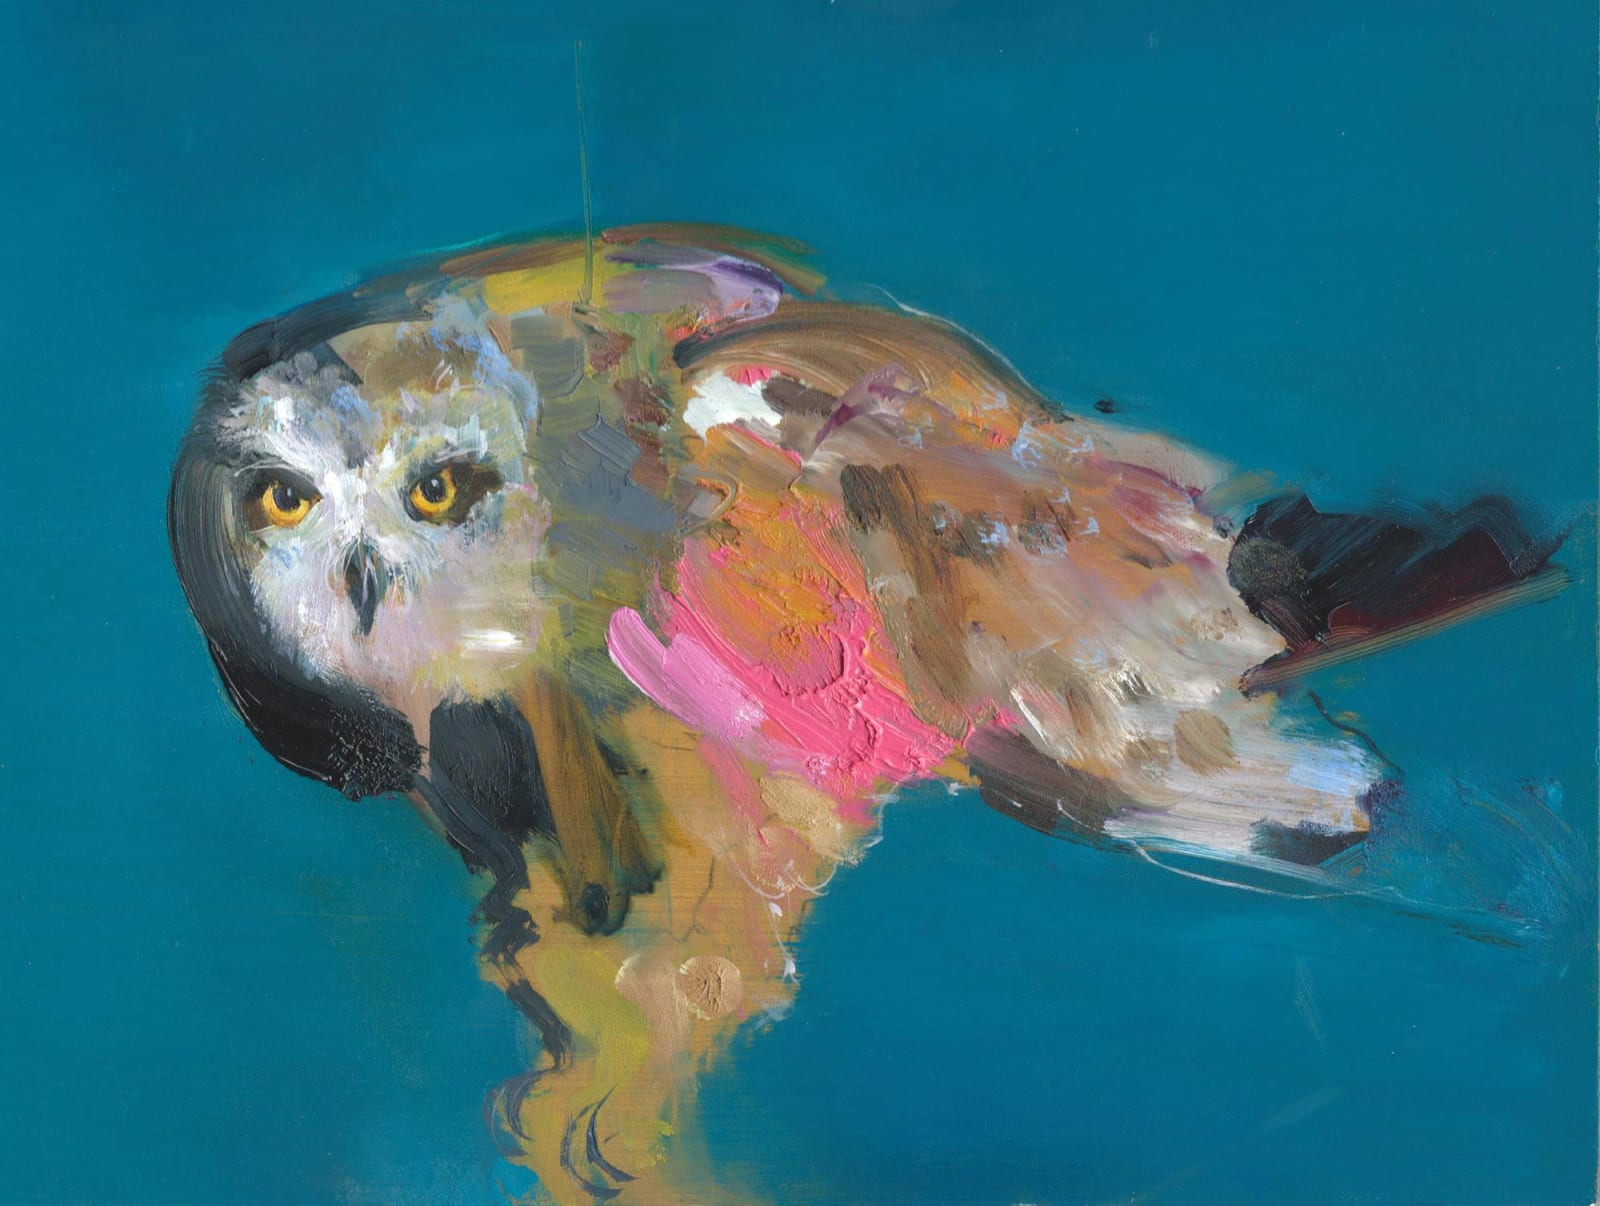 Gabhann Dunne  Suibhne  Oil on gesso panel  18 x 24 cm